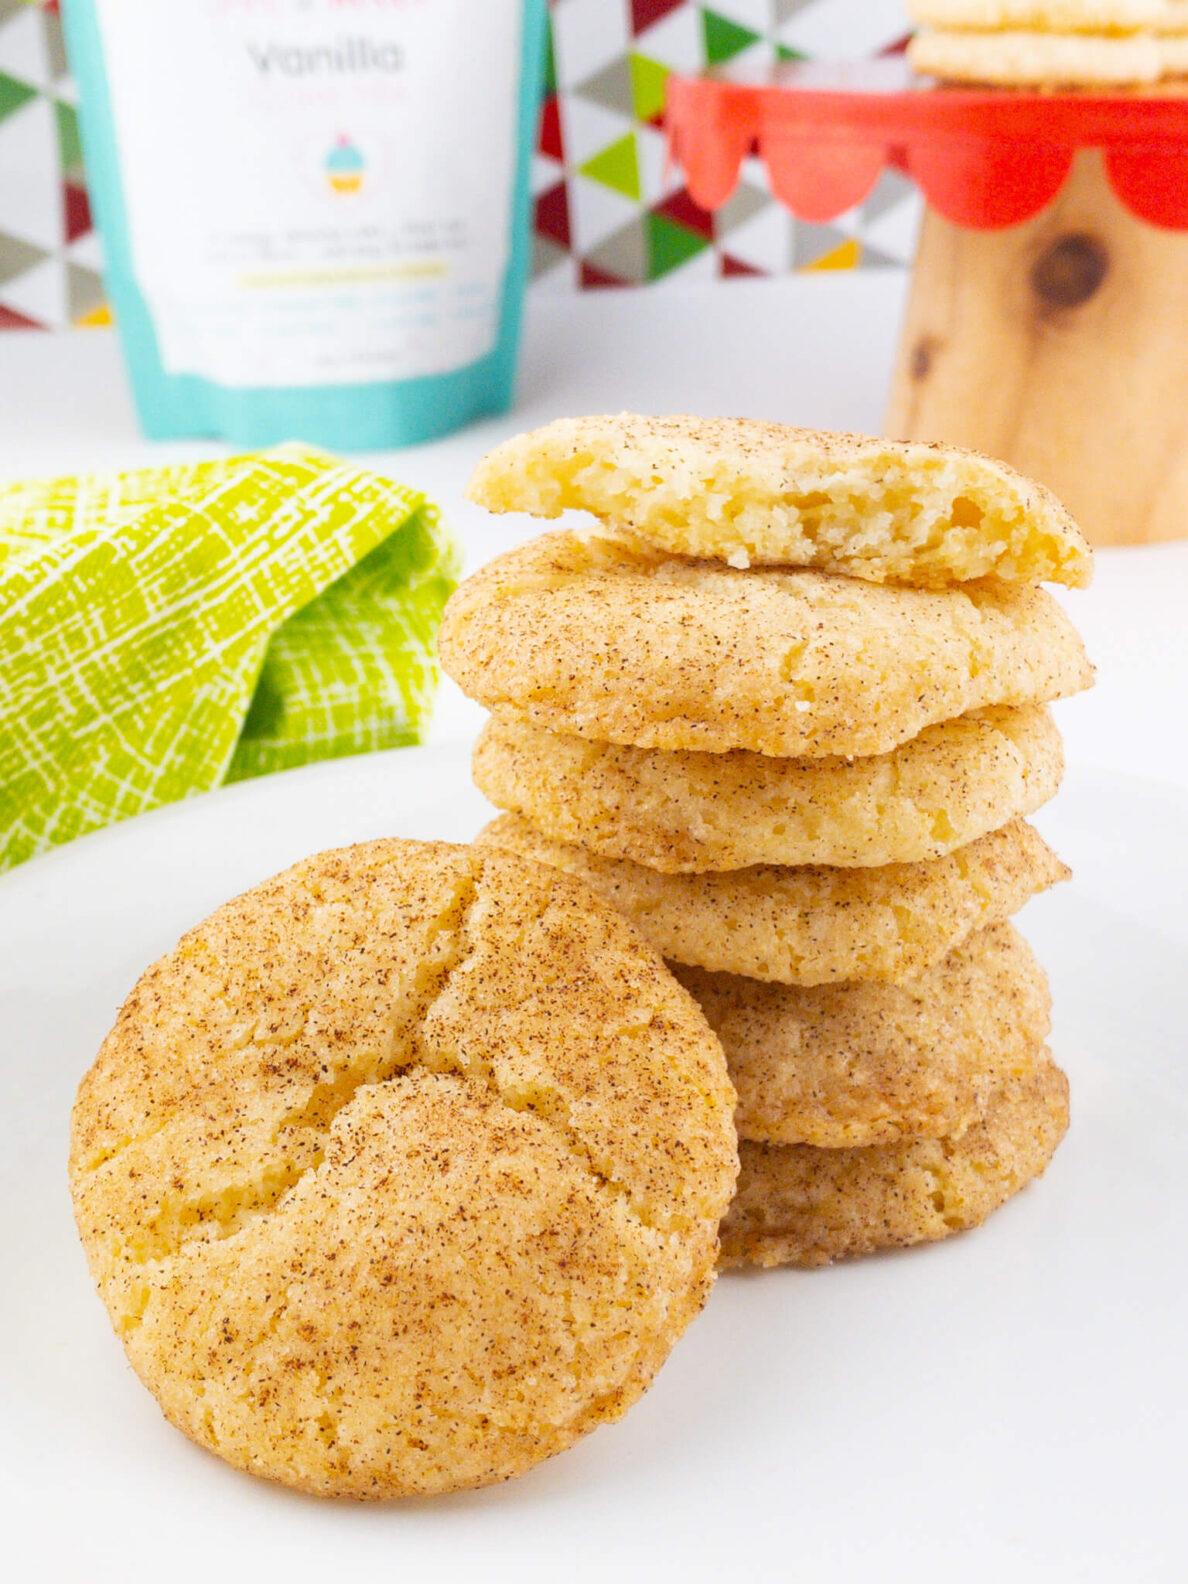 Kate's Safe and Sweet - Cinnamon Sugar Cookies